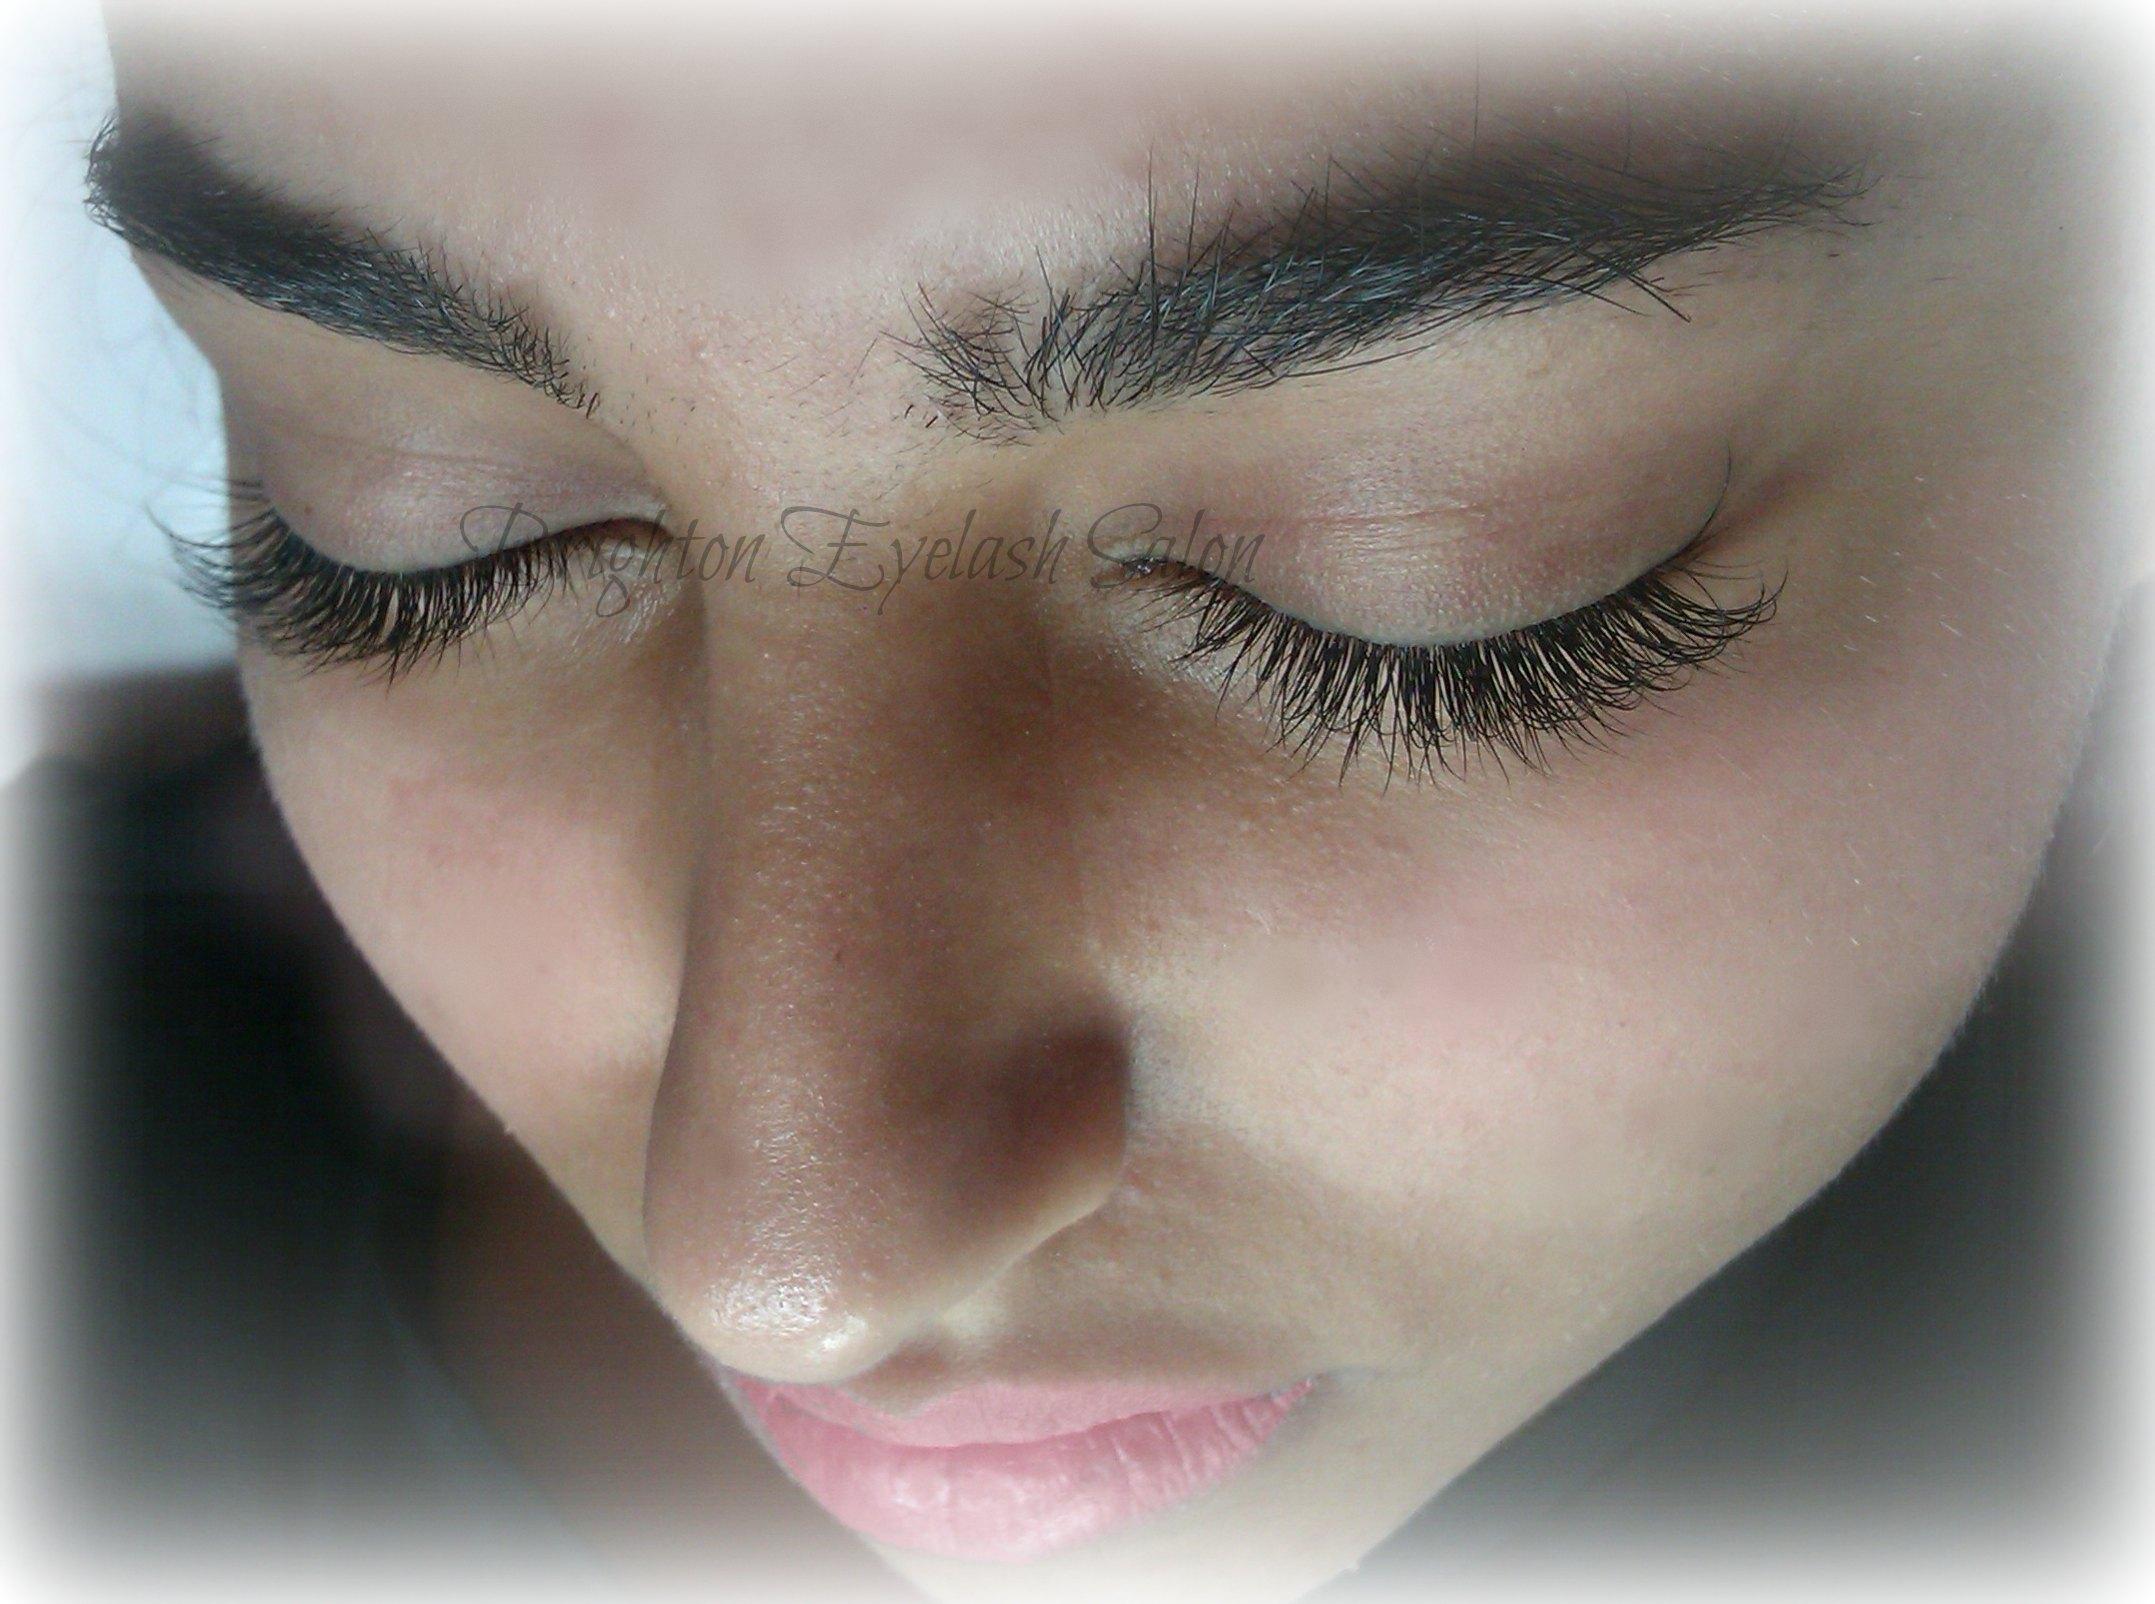 Permanent Eyelash Extensions Cost Uk